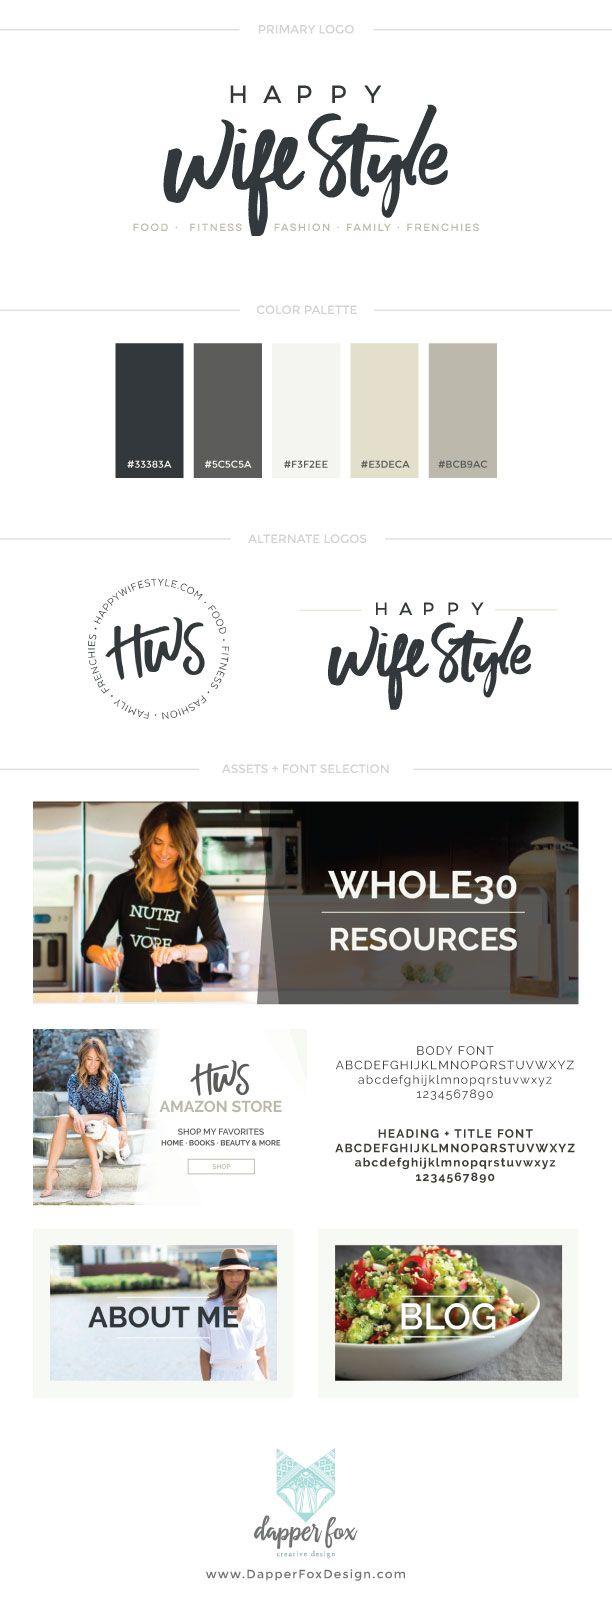 Portfolio :: Branding + Website Design - Happy WifeStyle — Dapper Fox Design - Branding + Website Design